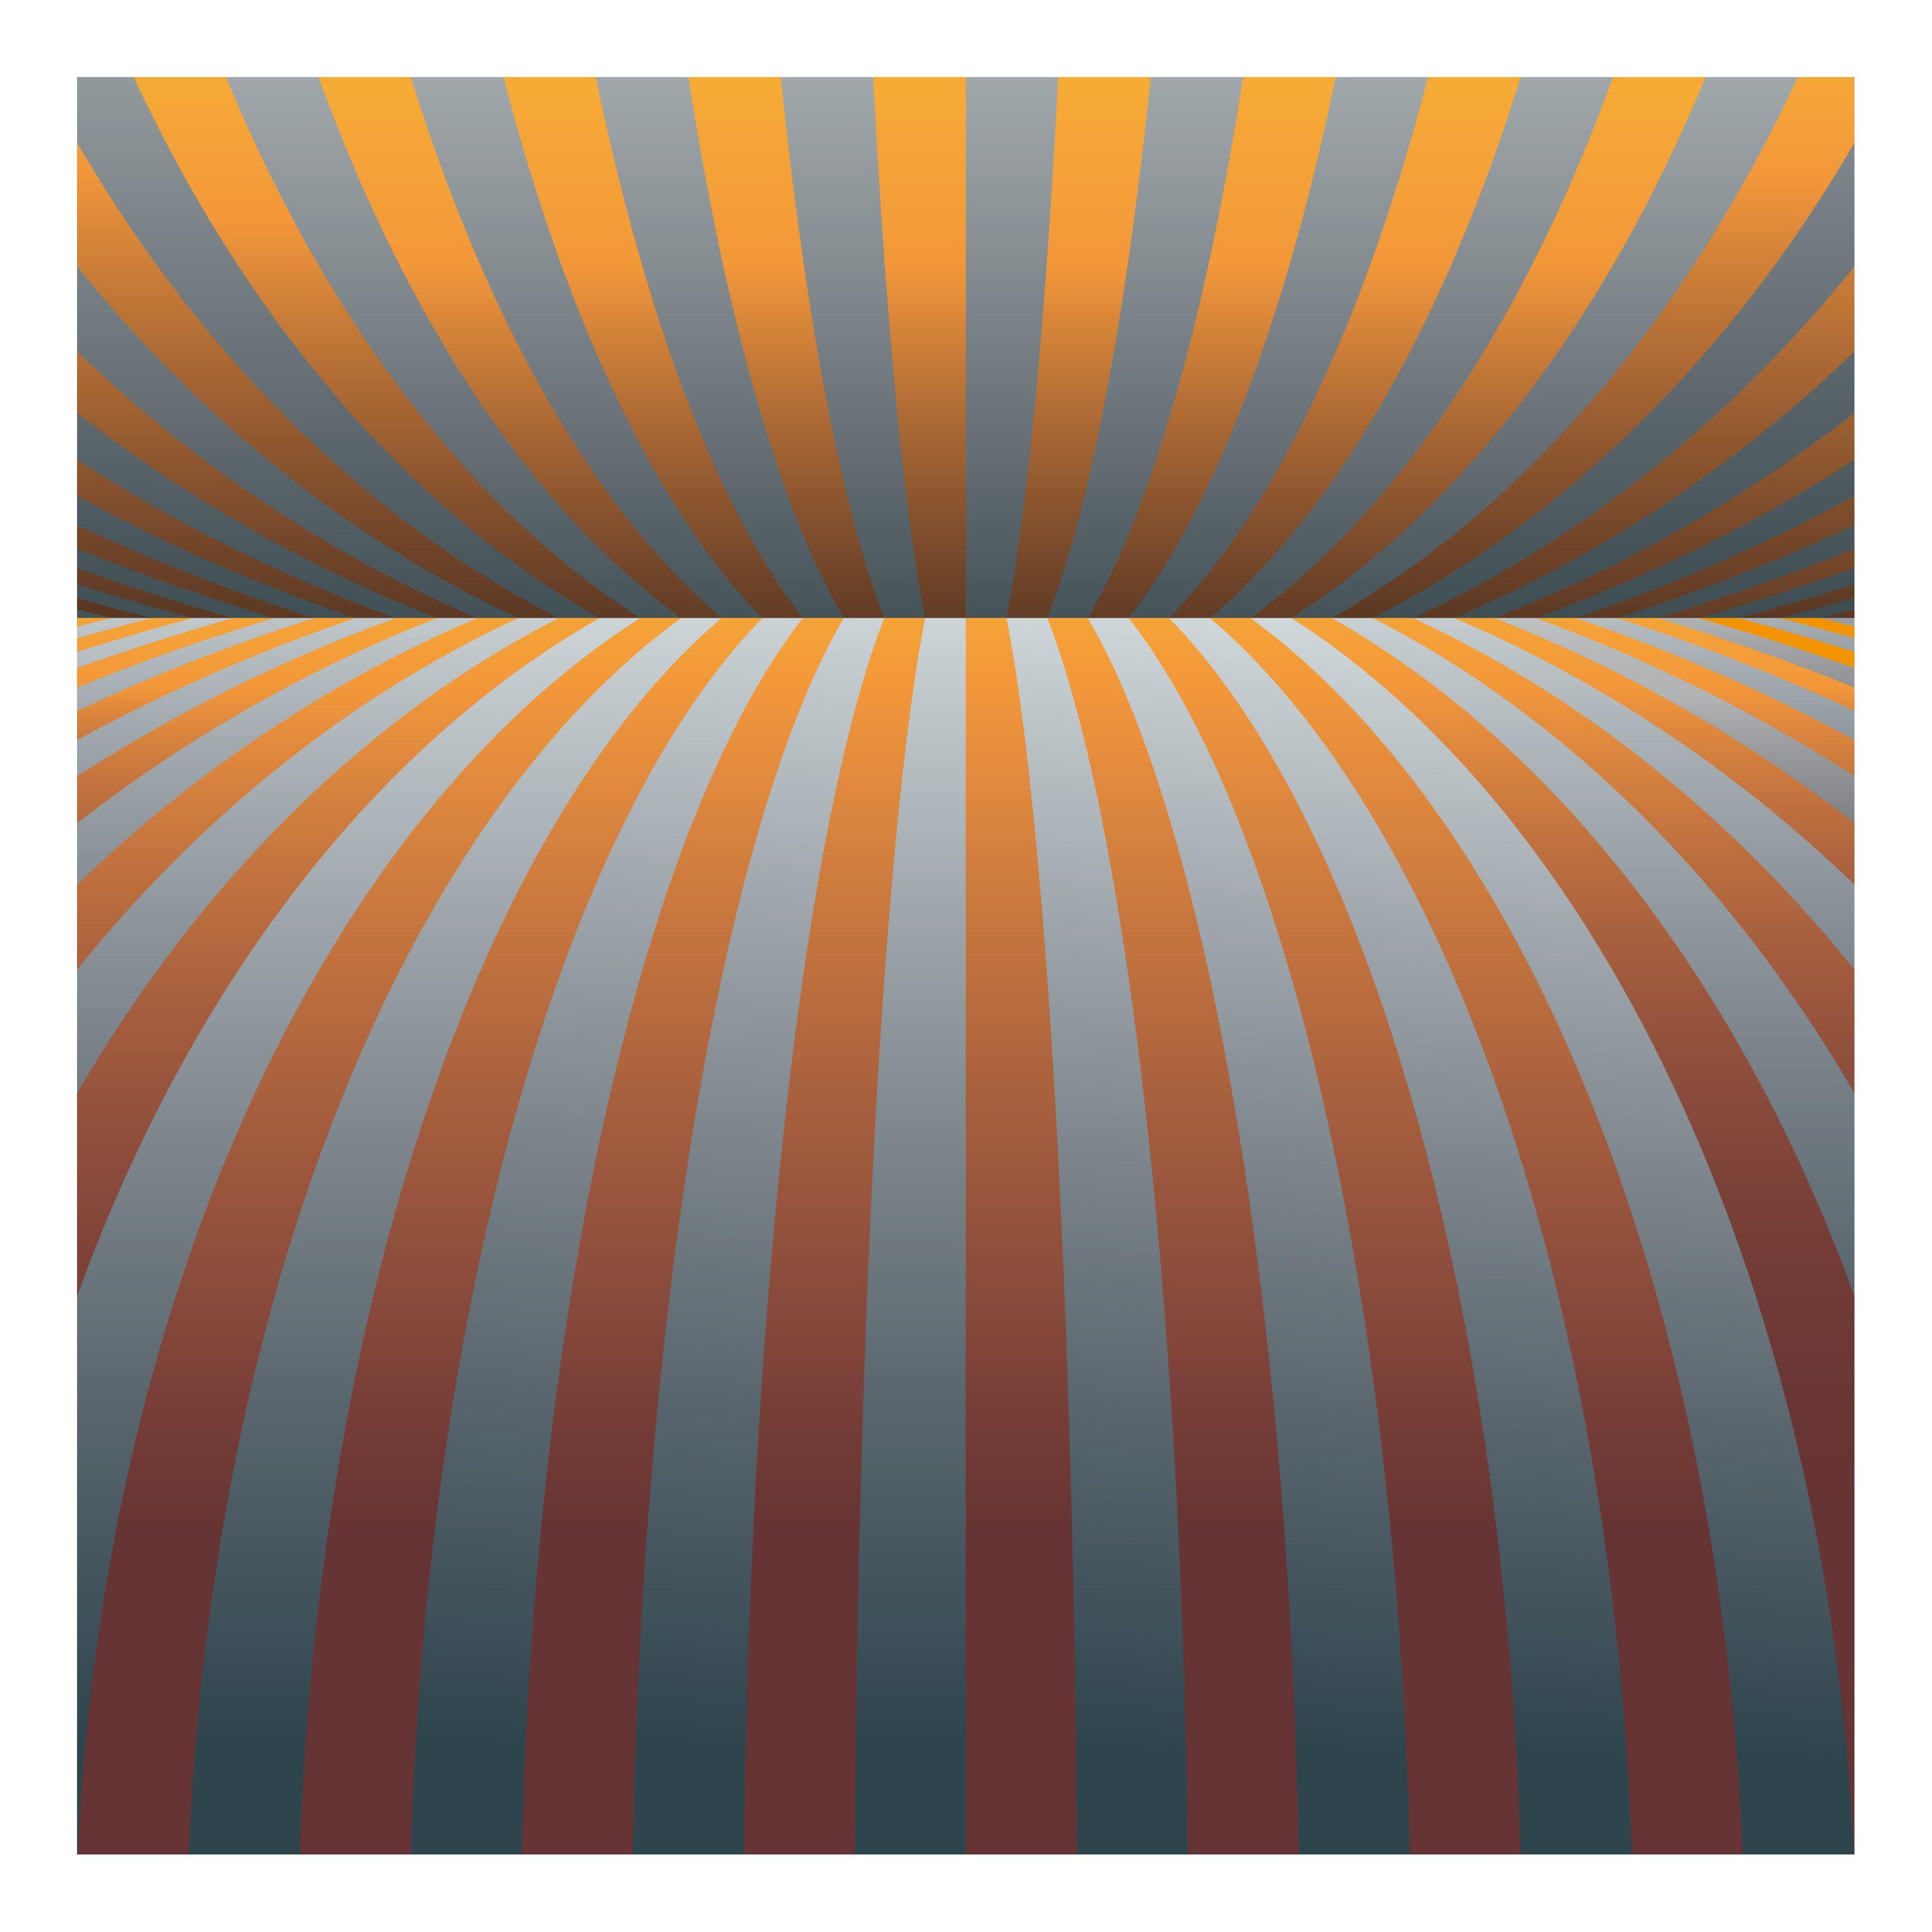 orange-and-grey-horizon.jpg 3,937×3,937 pixels